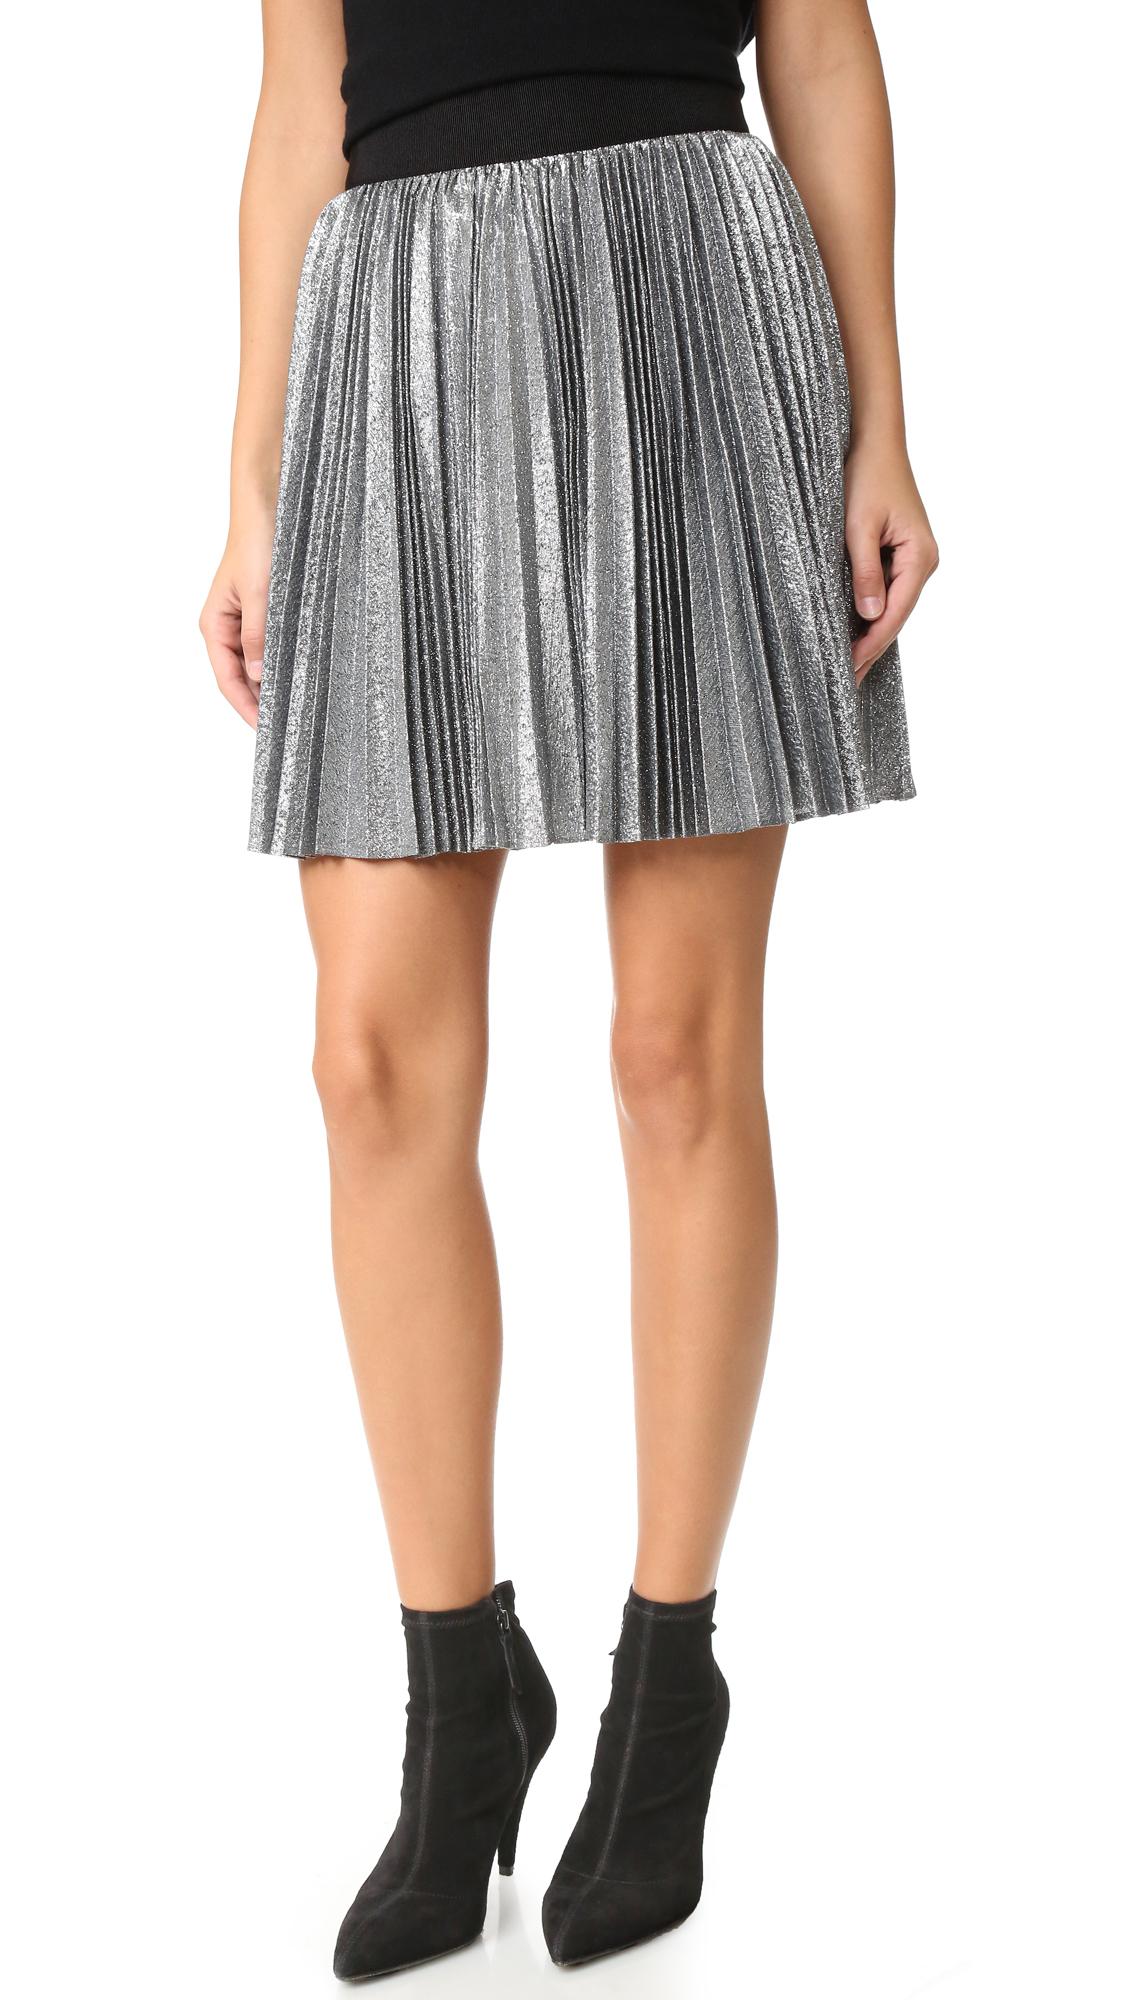 Alice + Olivia Danica Sunburst Pleated Miniskirt - Silver/Black at Shopbop